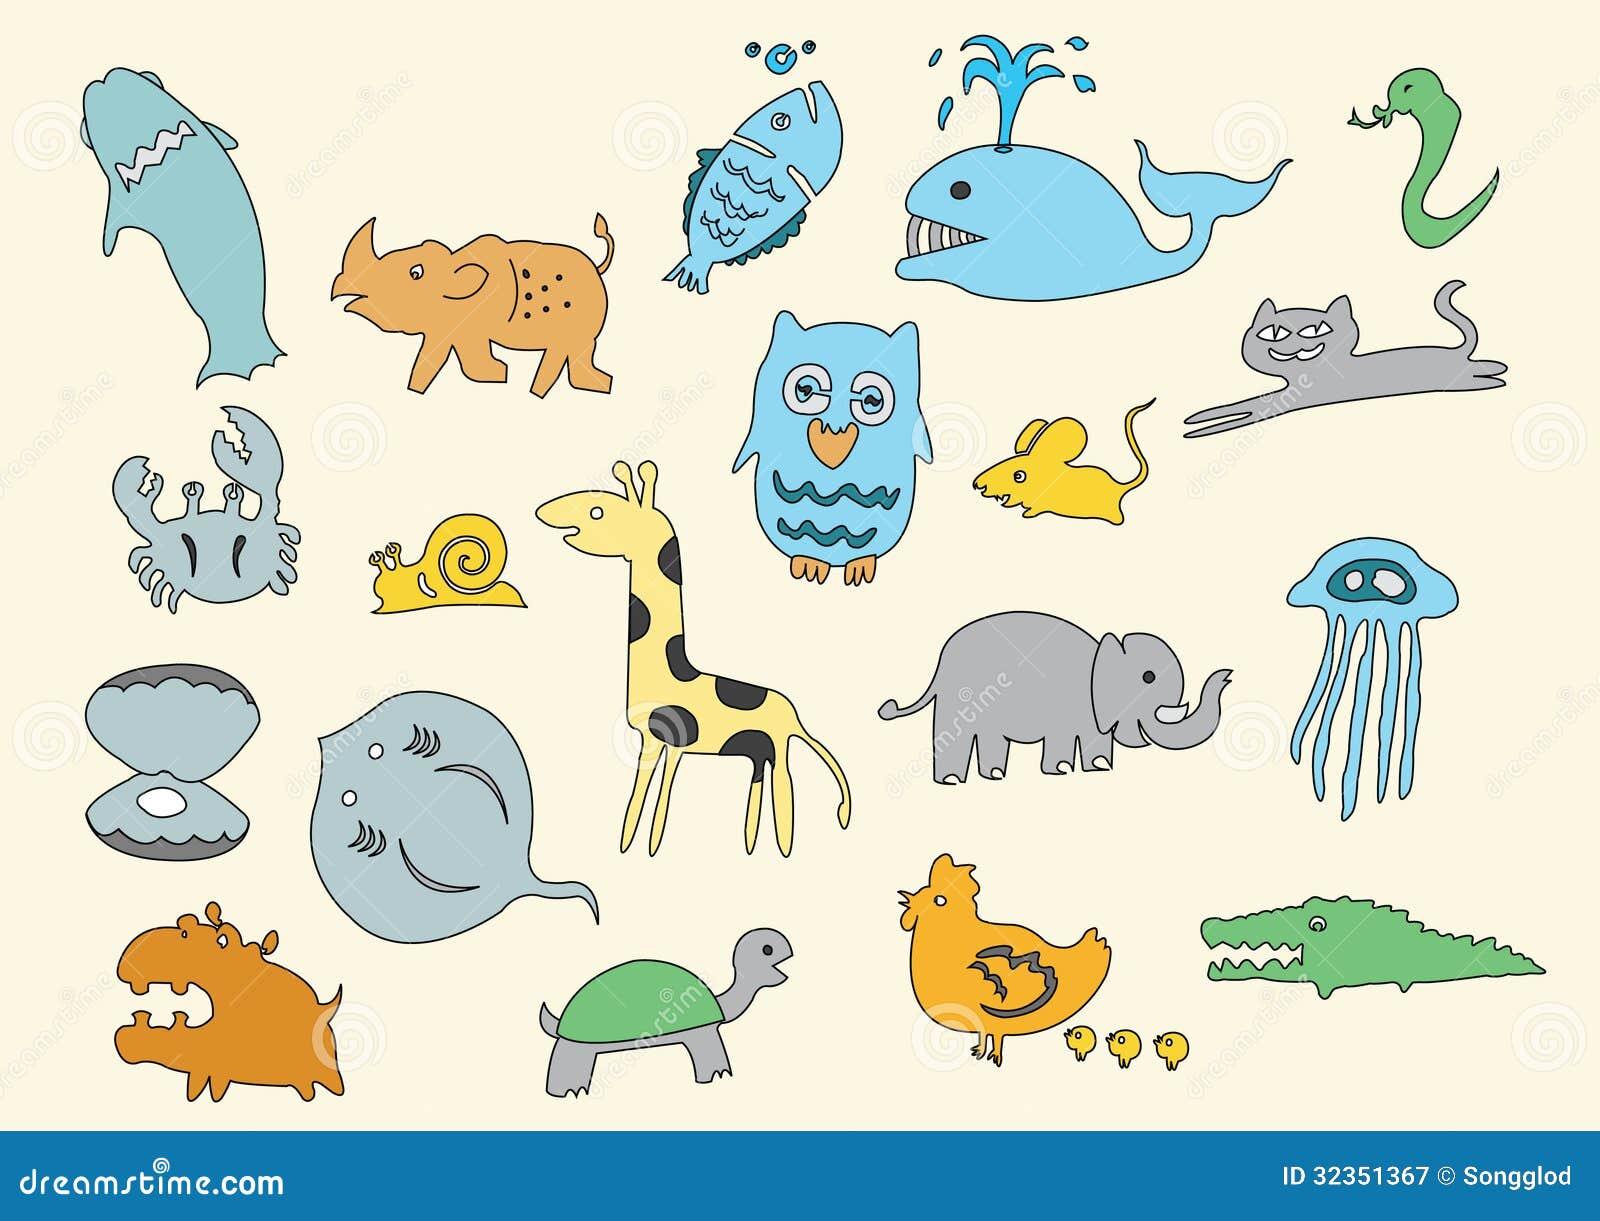 Animal Doodle Child Drawn Cartoon Art Royalty Free Stock Photography